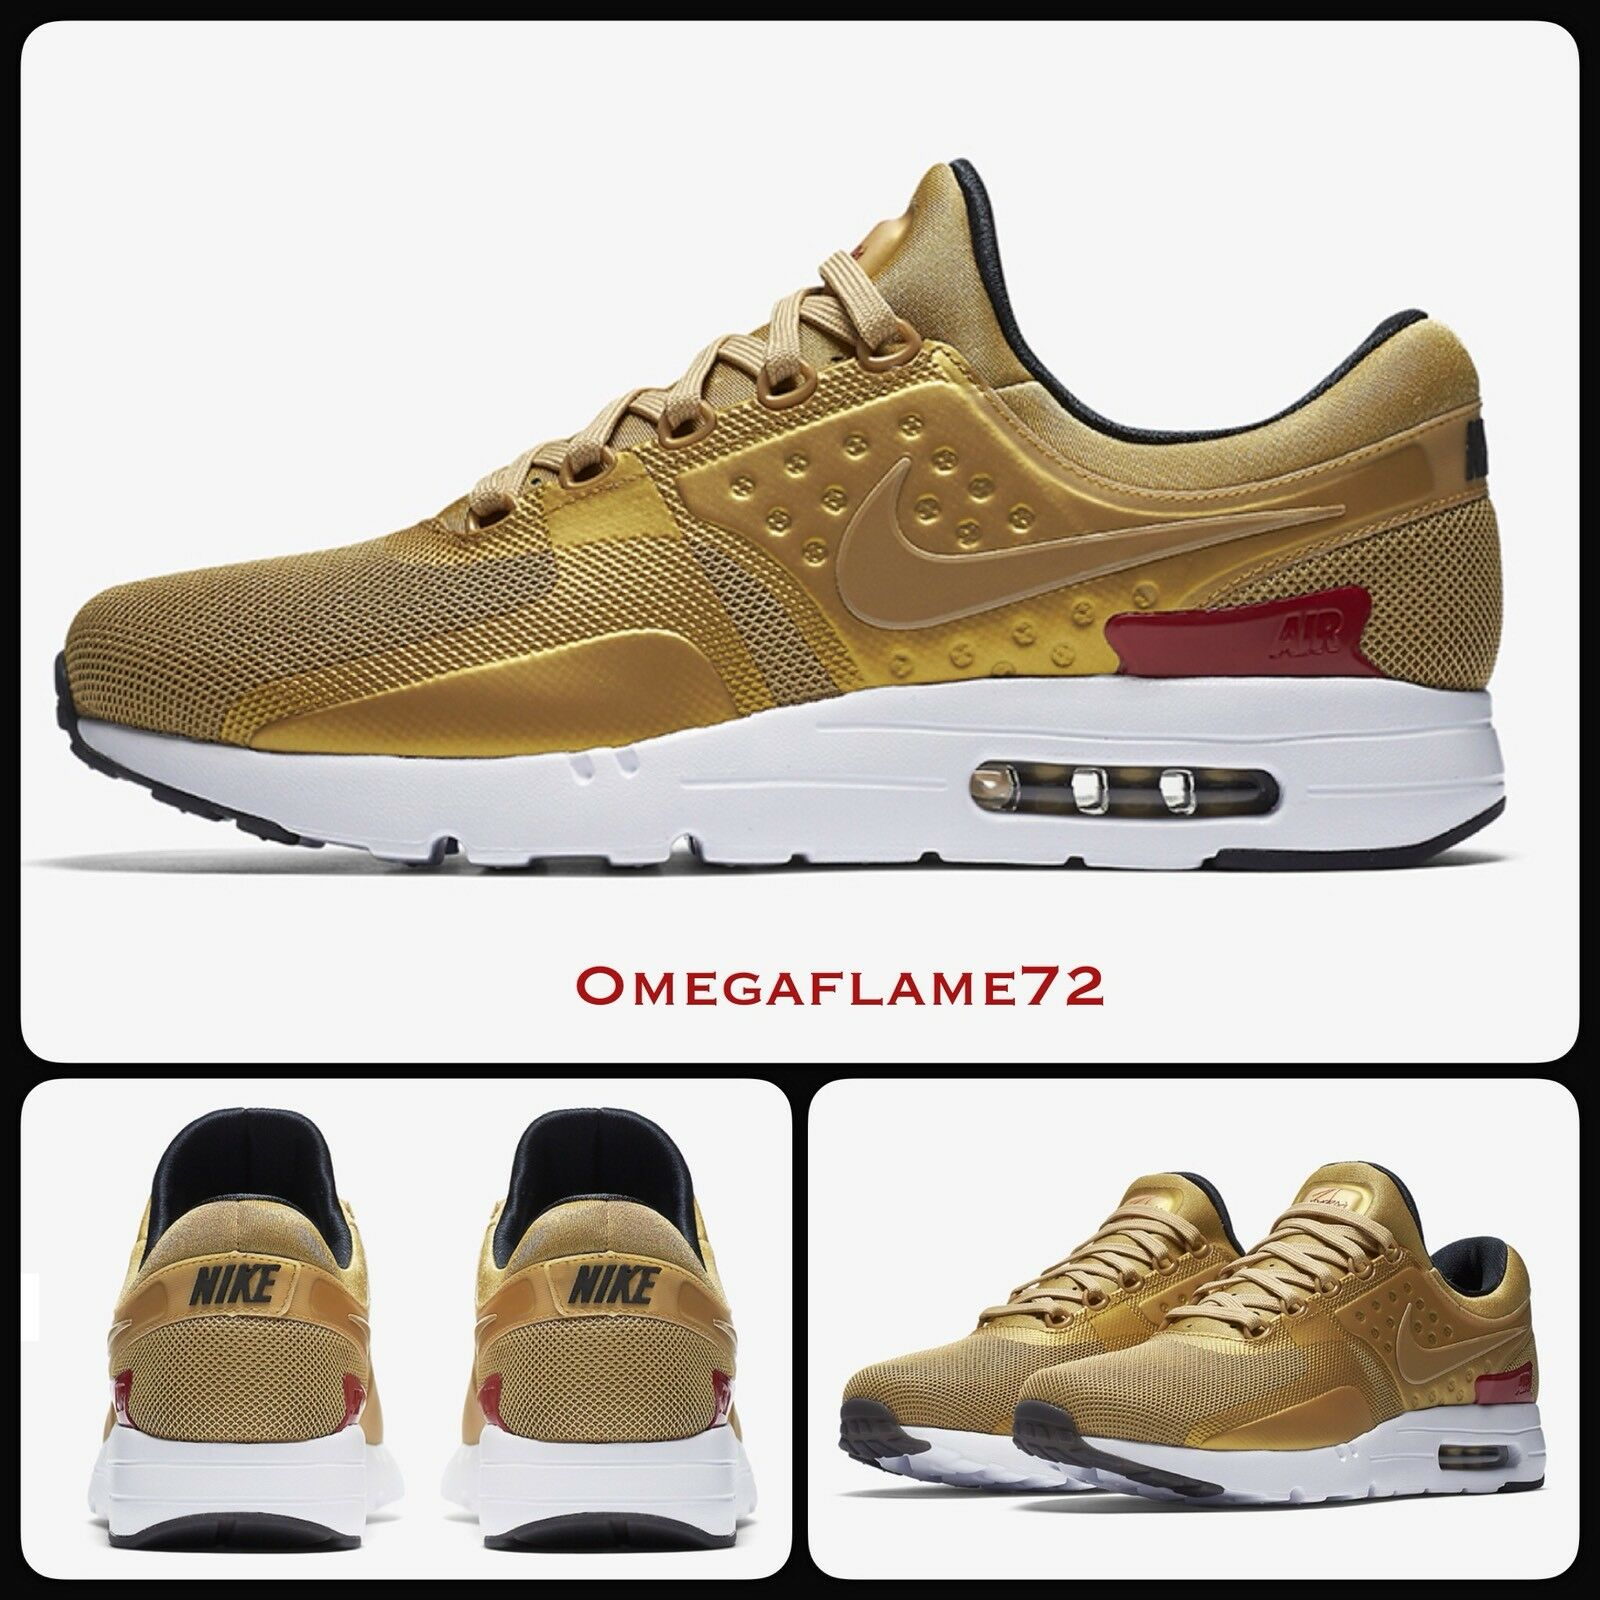 Nike Golden Air Max Zero QS Golden Nike Bullet 97 95 789695-700,11.5 EU 47 US 12.5 6476d0